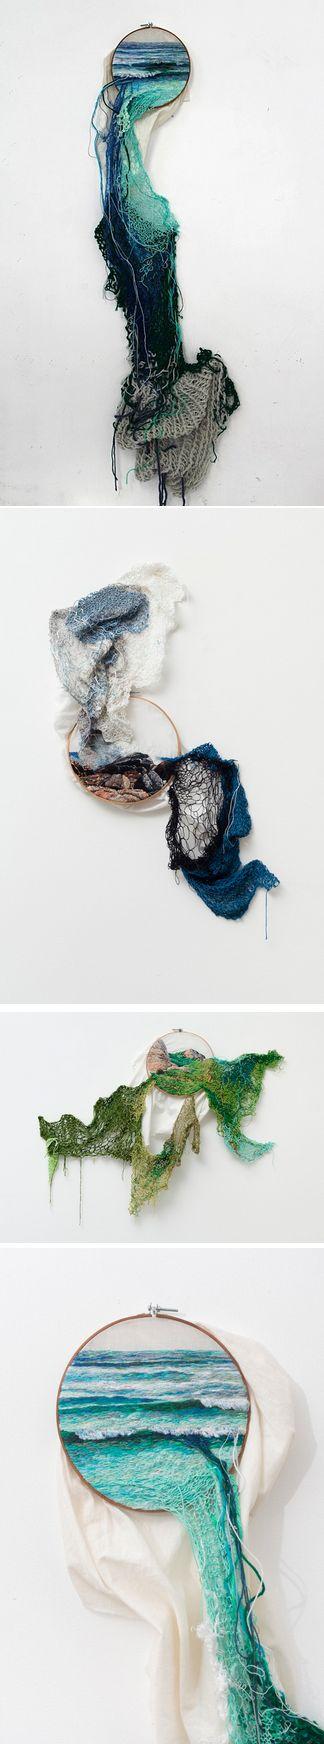 Embroidery by Ana Teresa Barboza